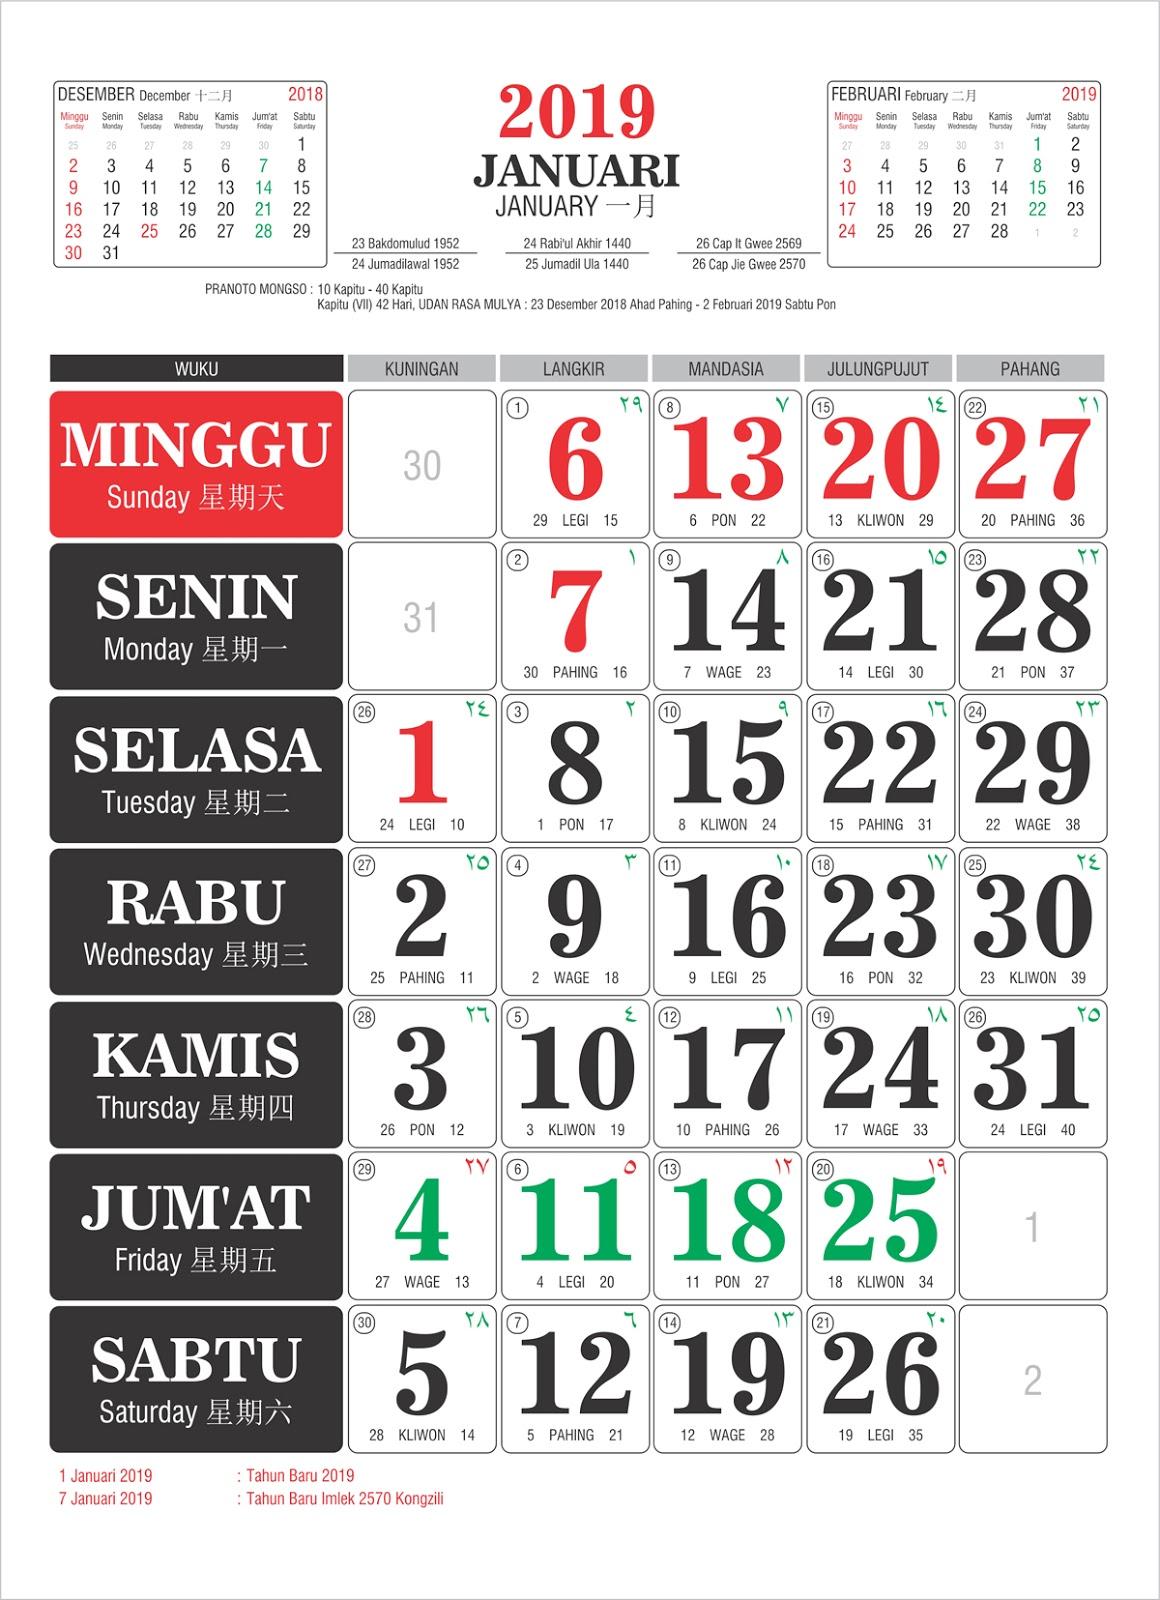 2018 Tempatnya Download Template Kalender 2015 Tanggalan 2015